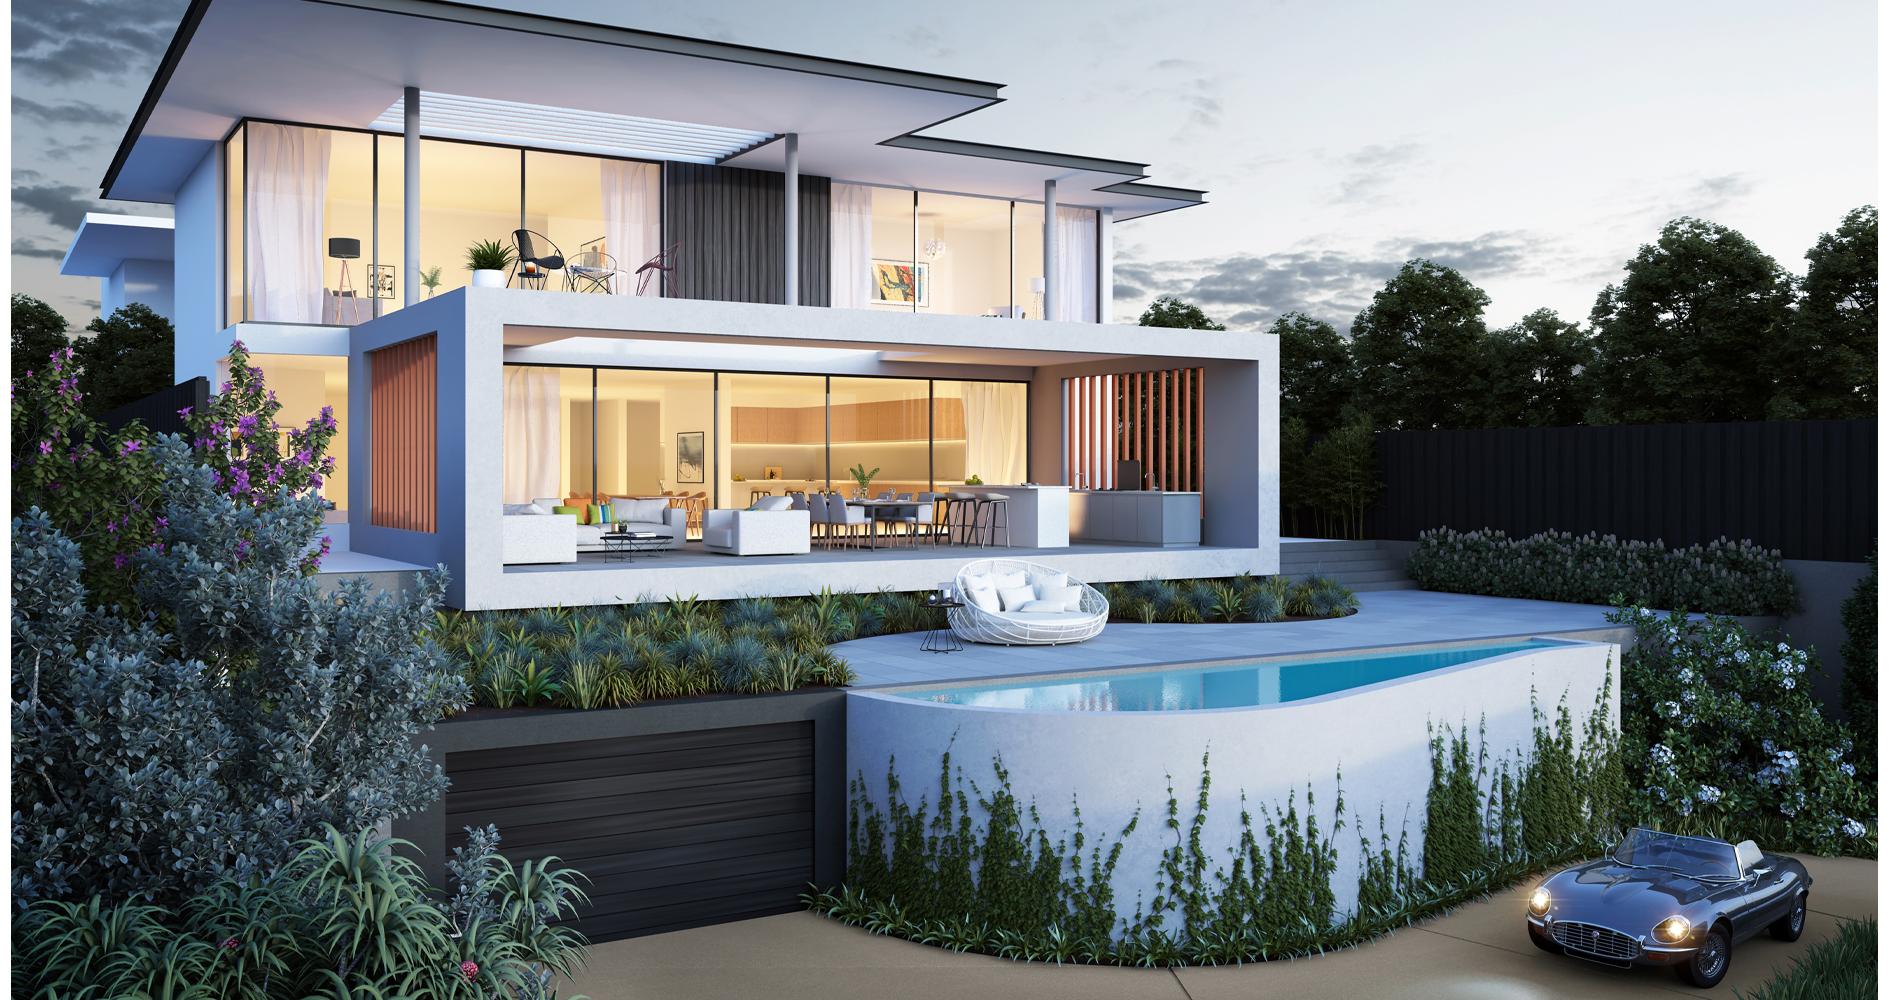 maek-custom-home-build-process-designs-in-development-9.jpg